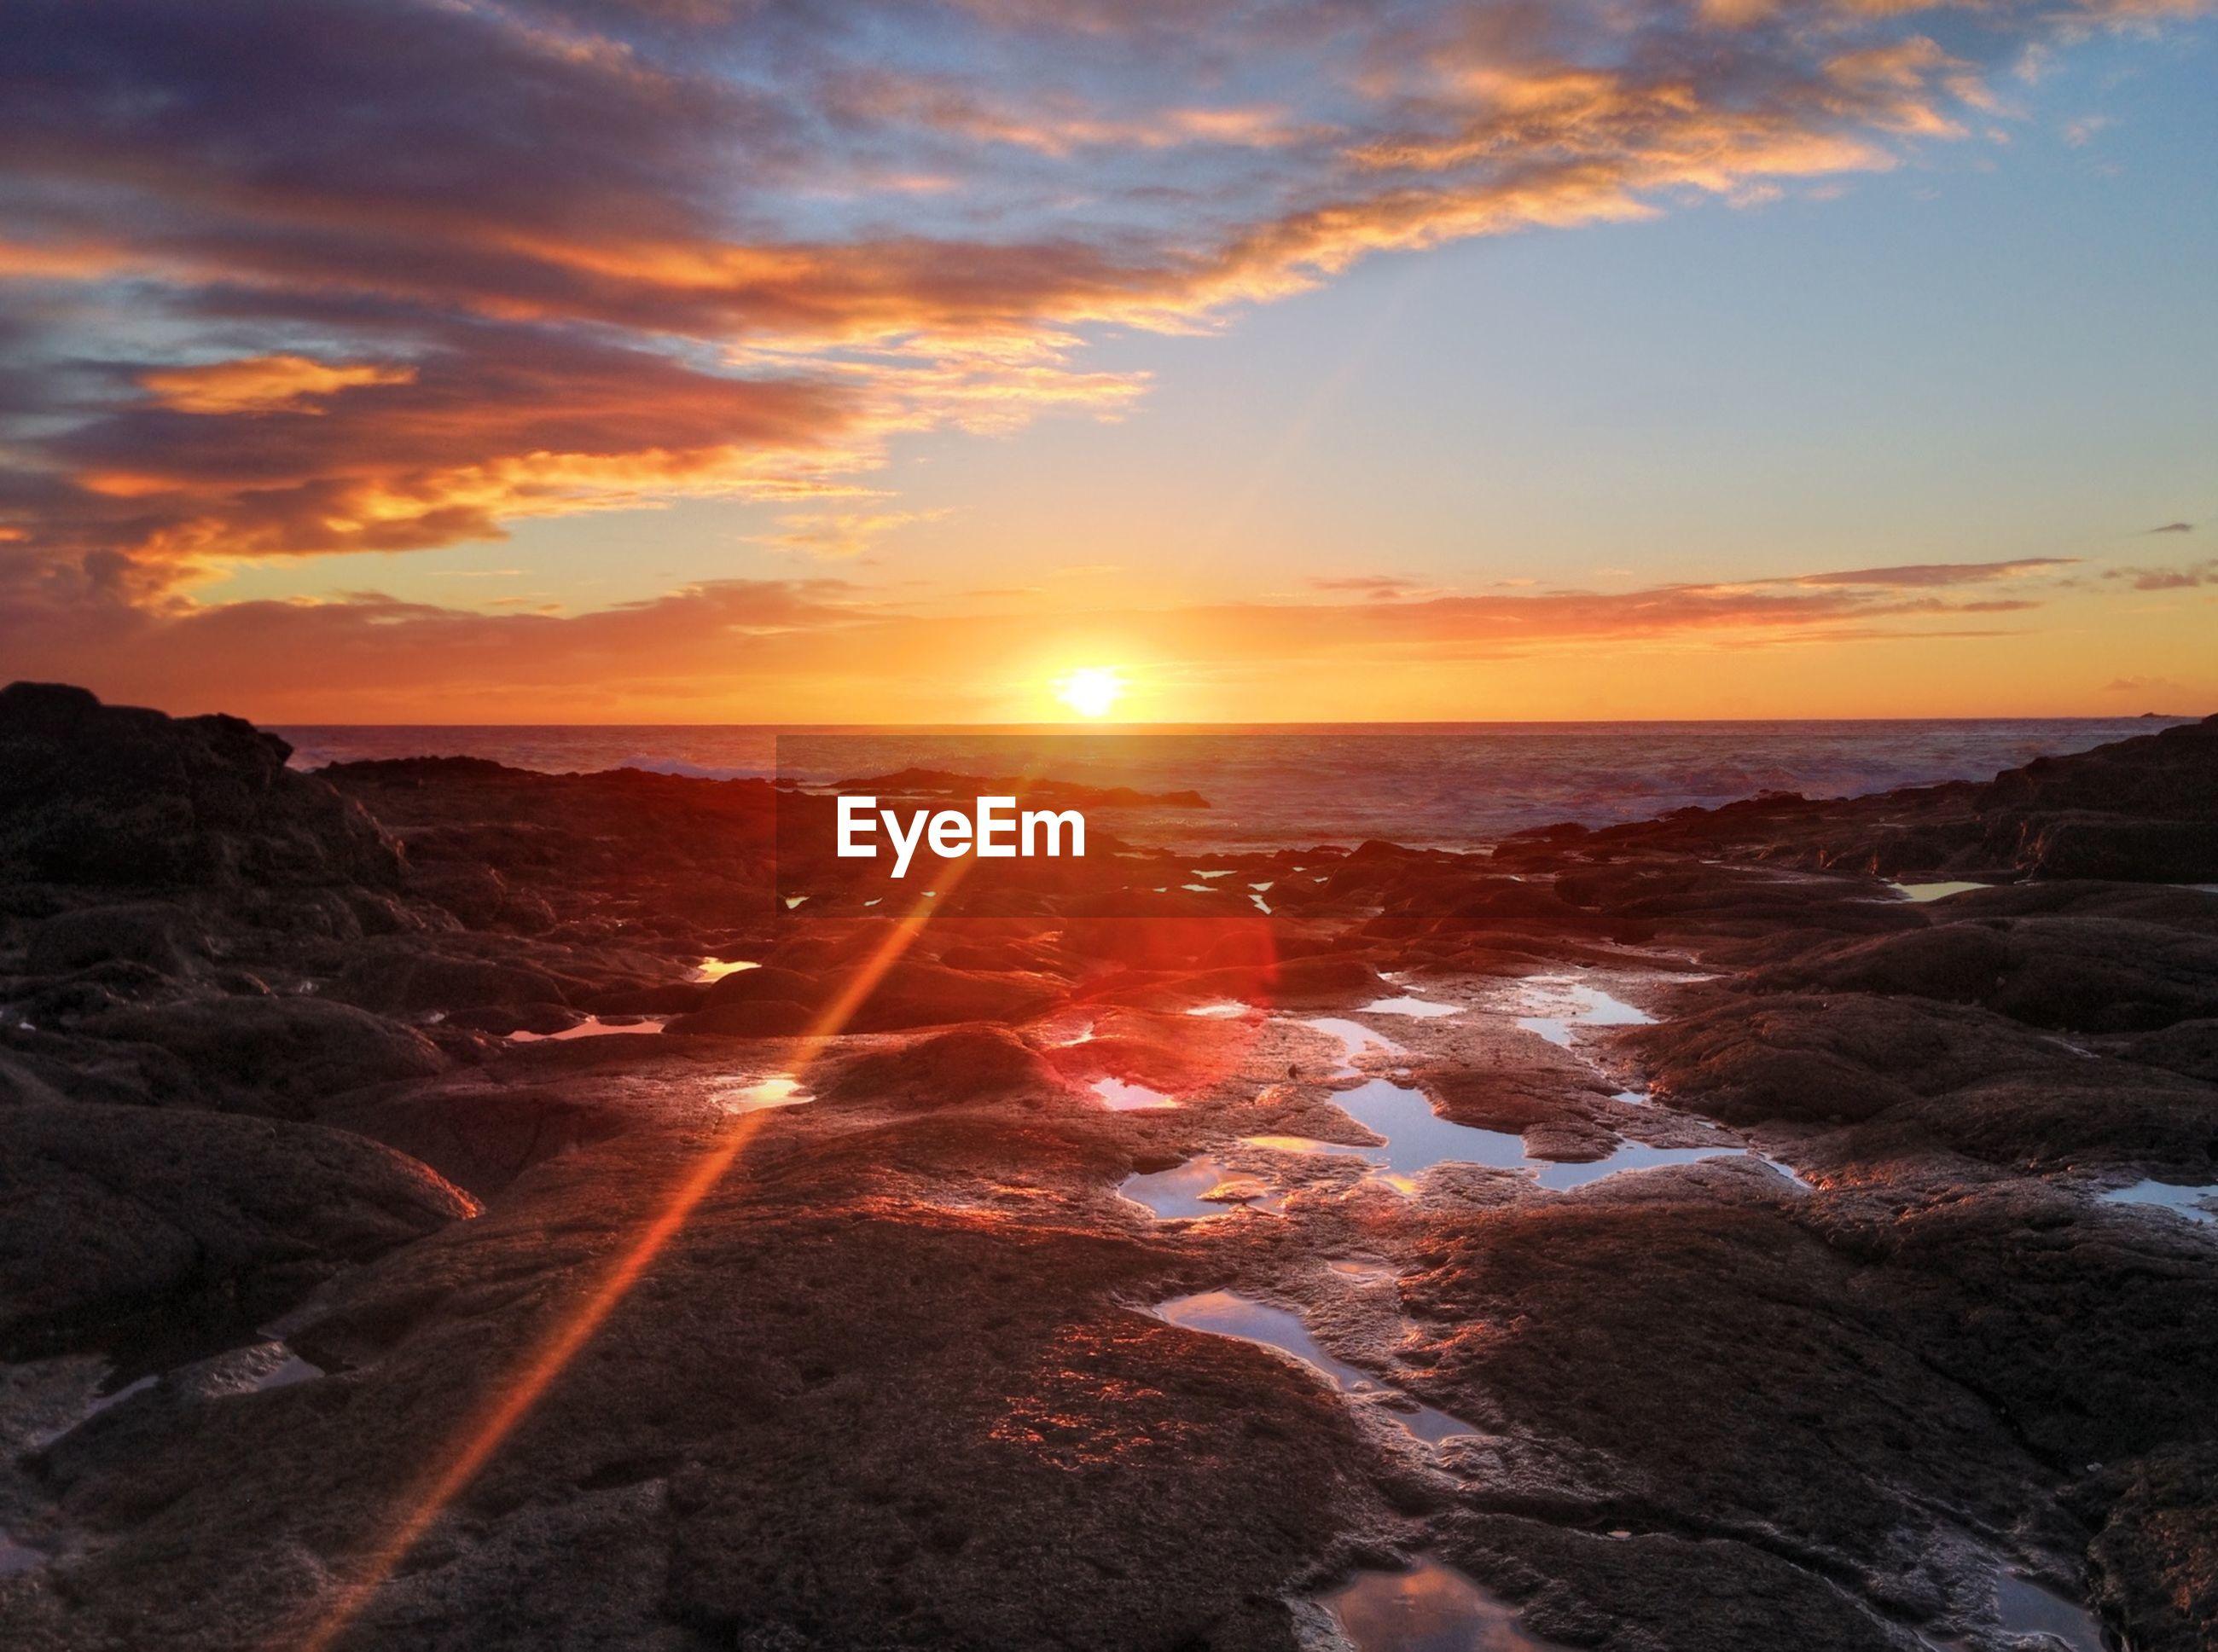 sunset, sun, sea, sky, water, scenics, beauty in nature, beach, tranquil scene, orange color, tranquility, horizon over water, cloud - sky, sunbeam, nature, shore, lens flare, sunlight, idyllic, rock - object